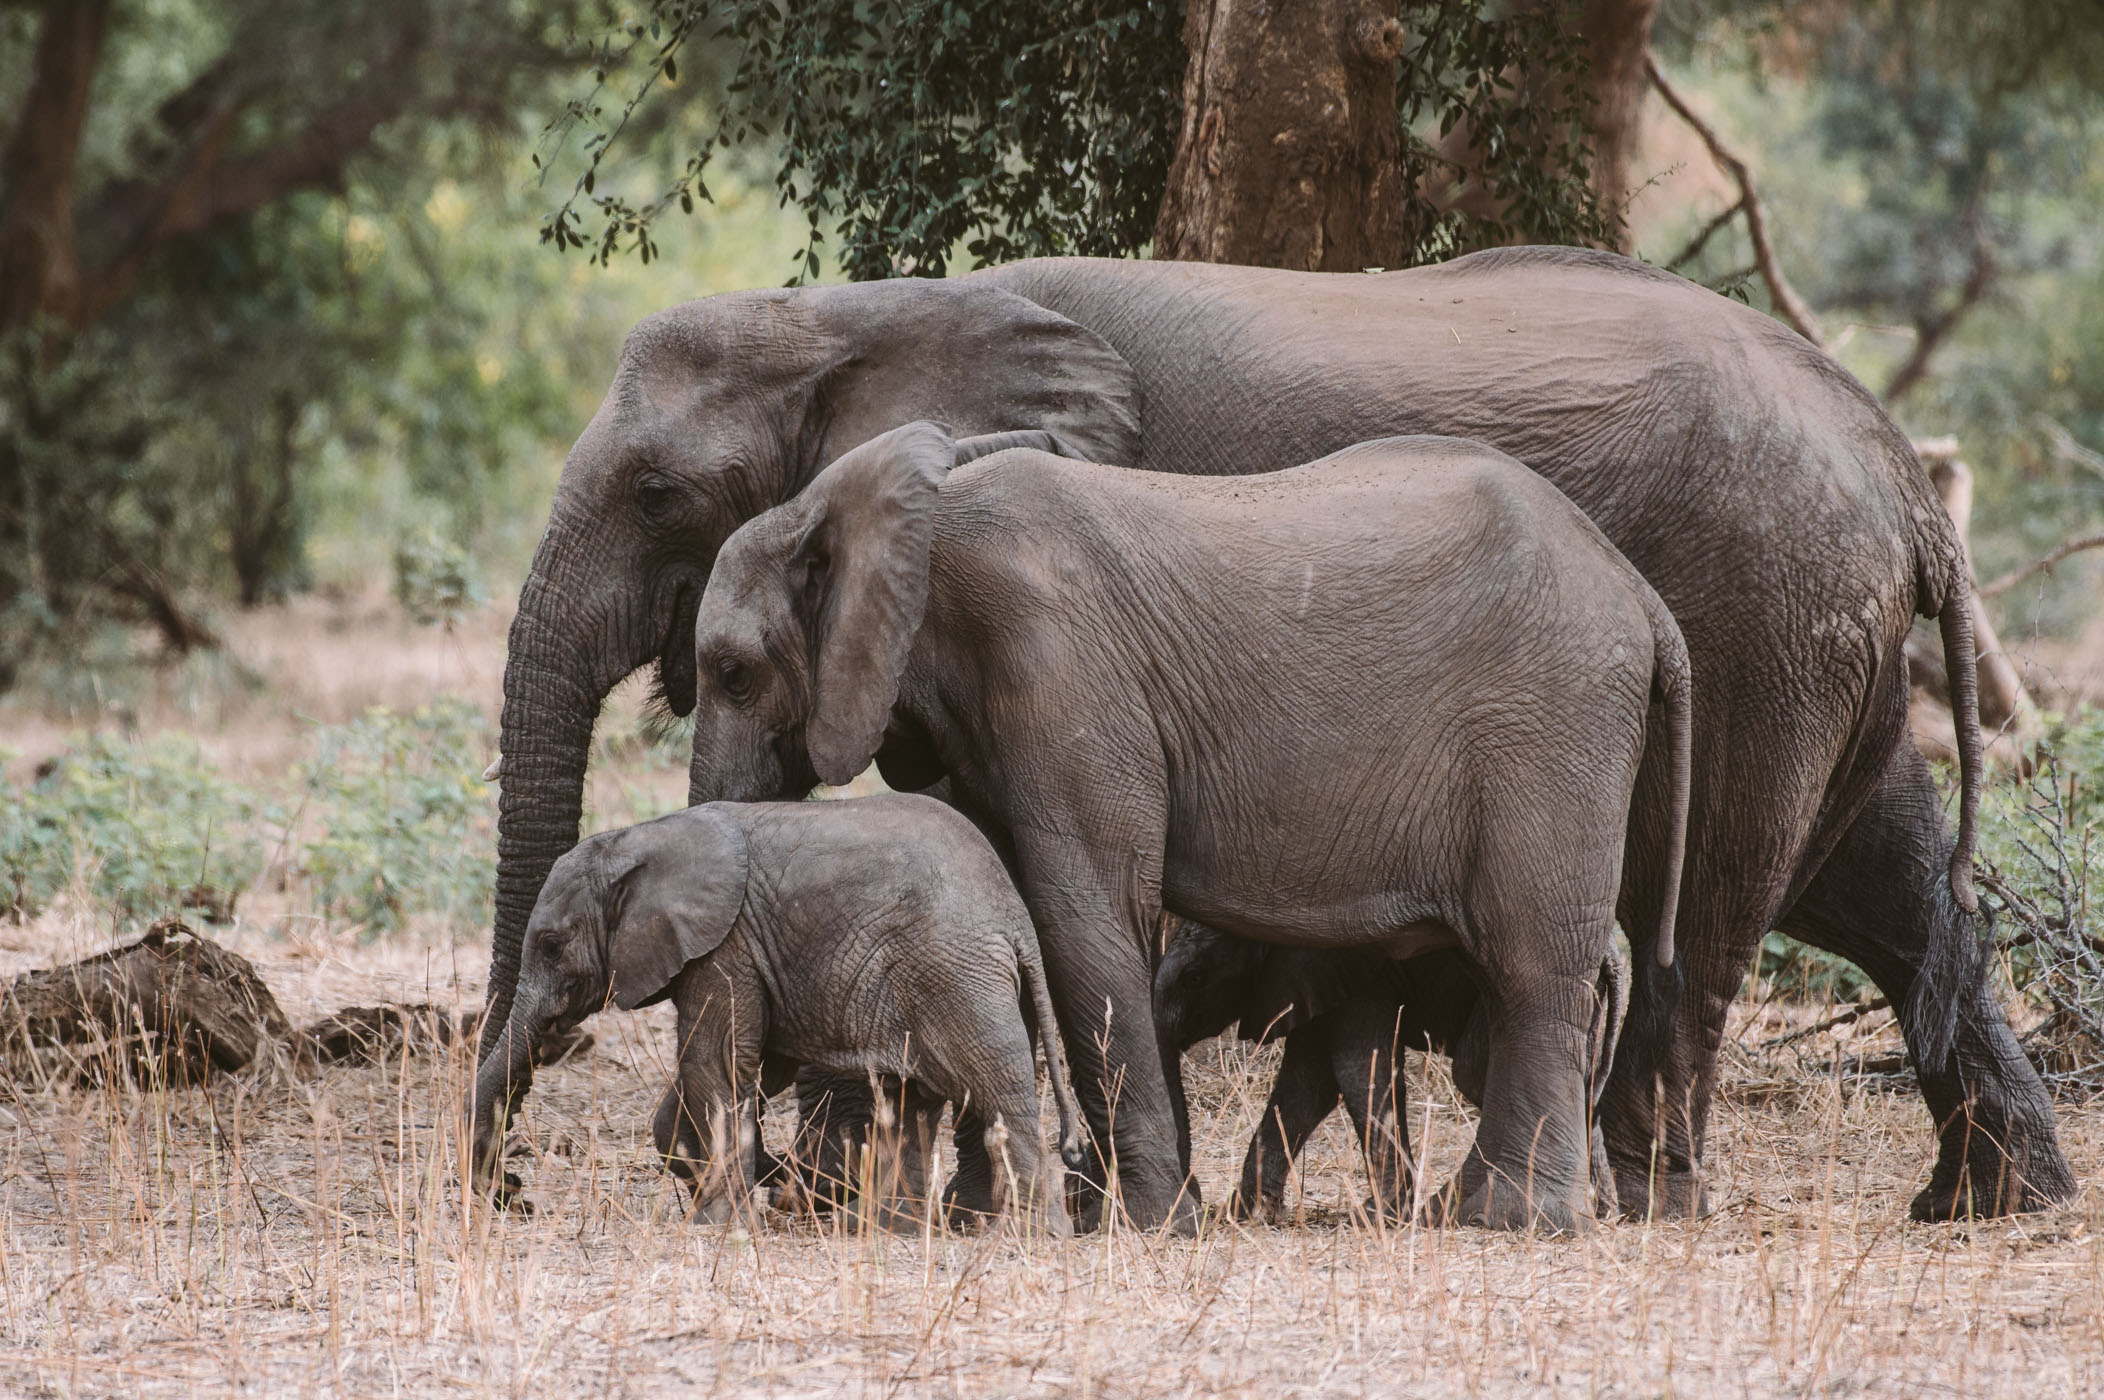 Elephants in the Lower zambezi National Park